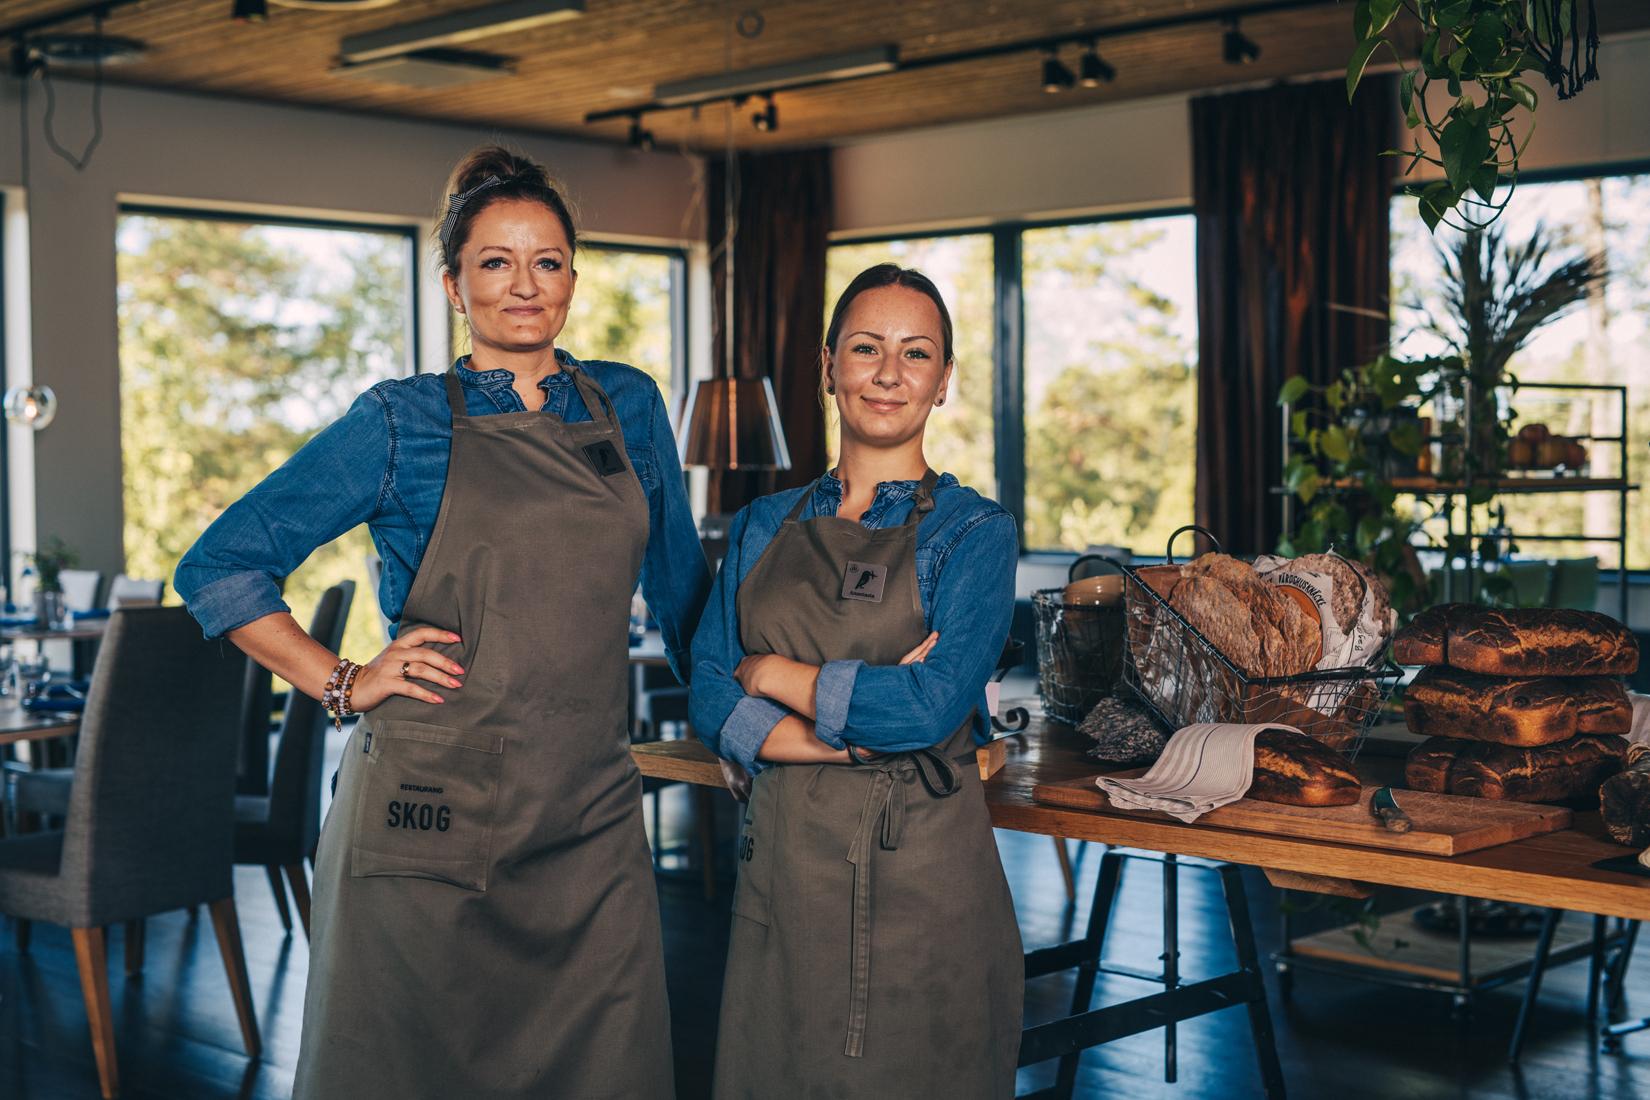 sigtunahöjden Restaurang Skog personal